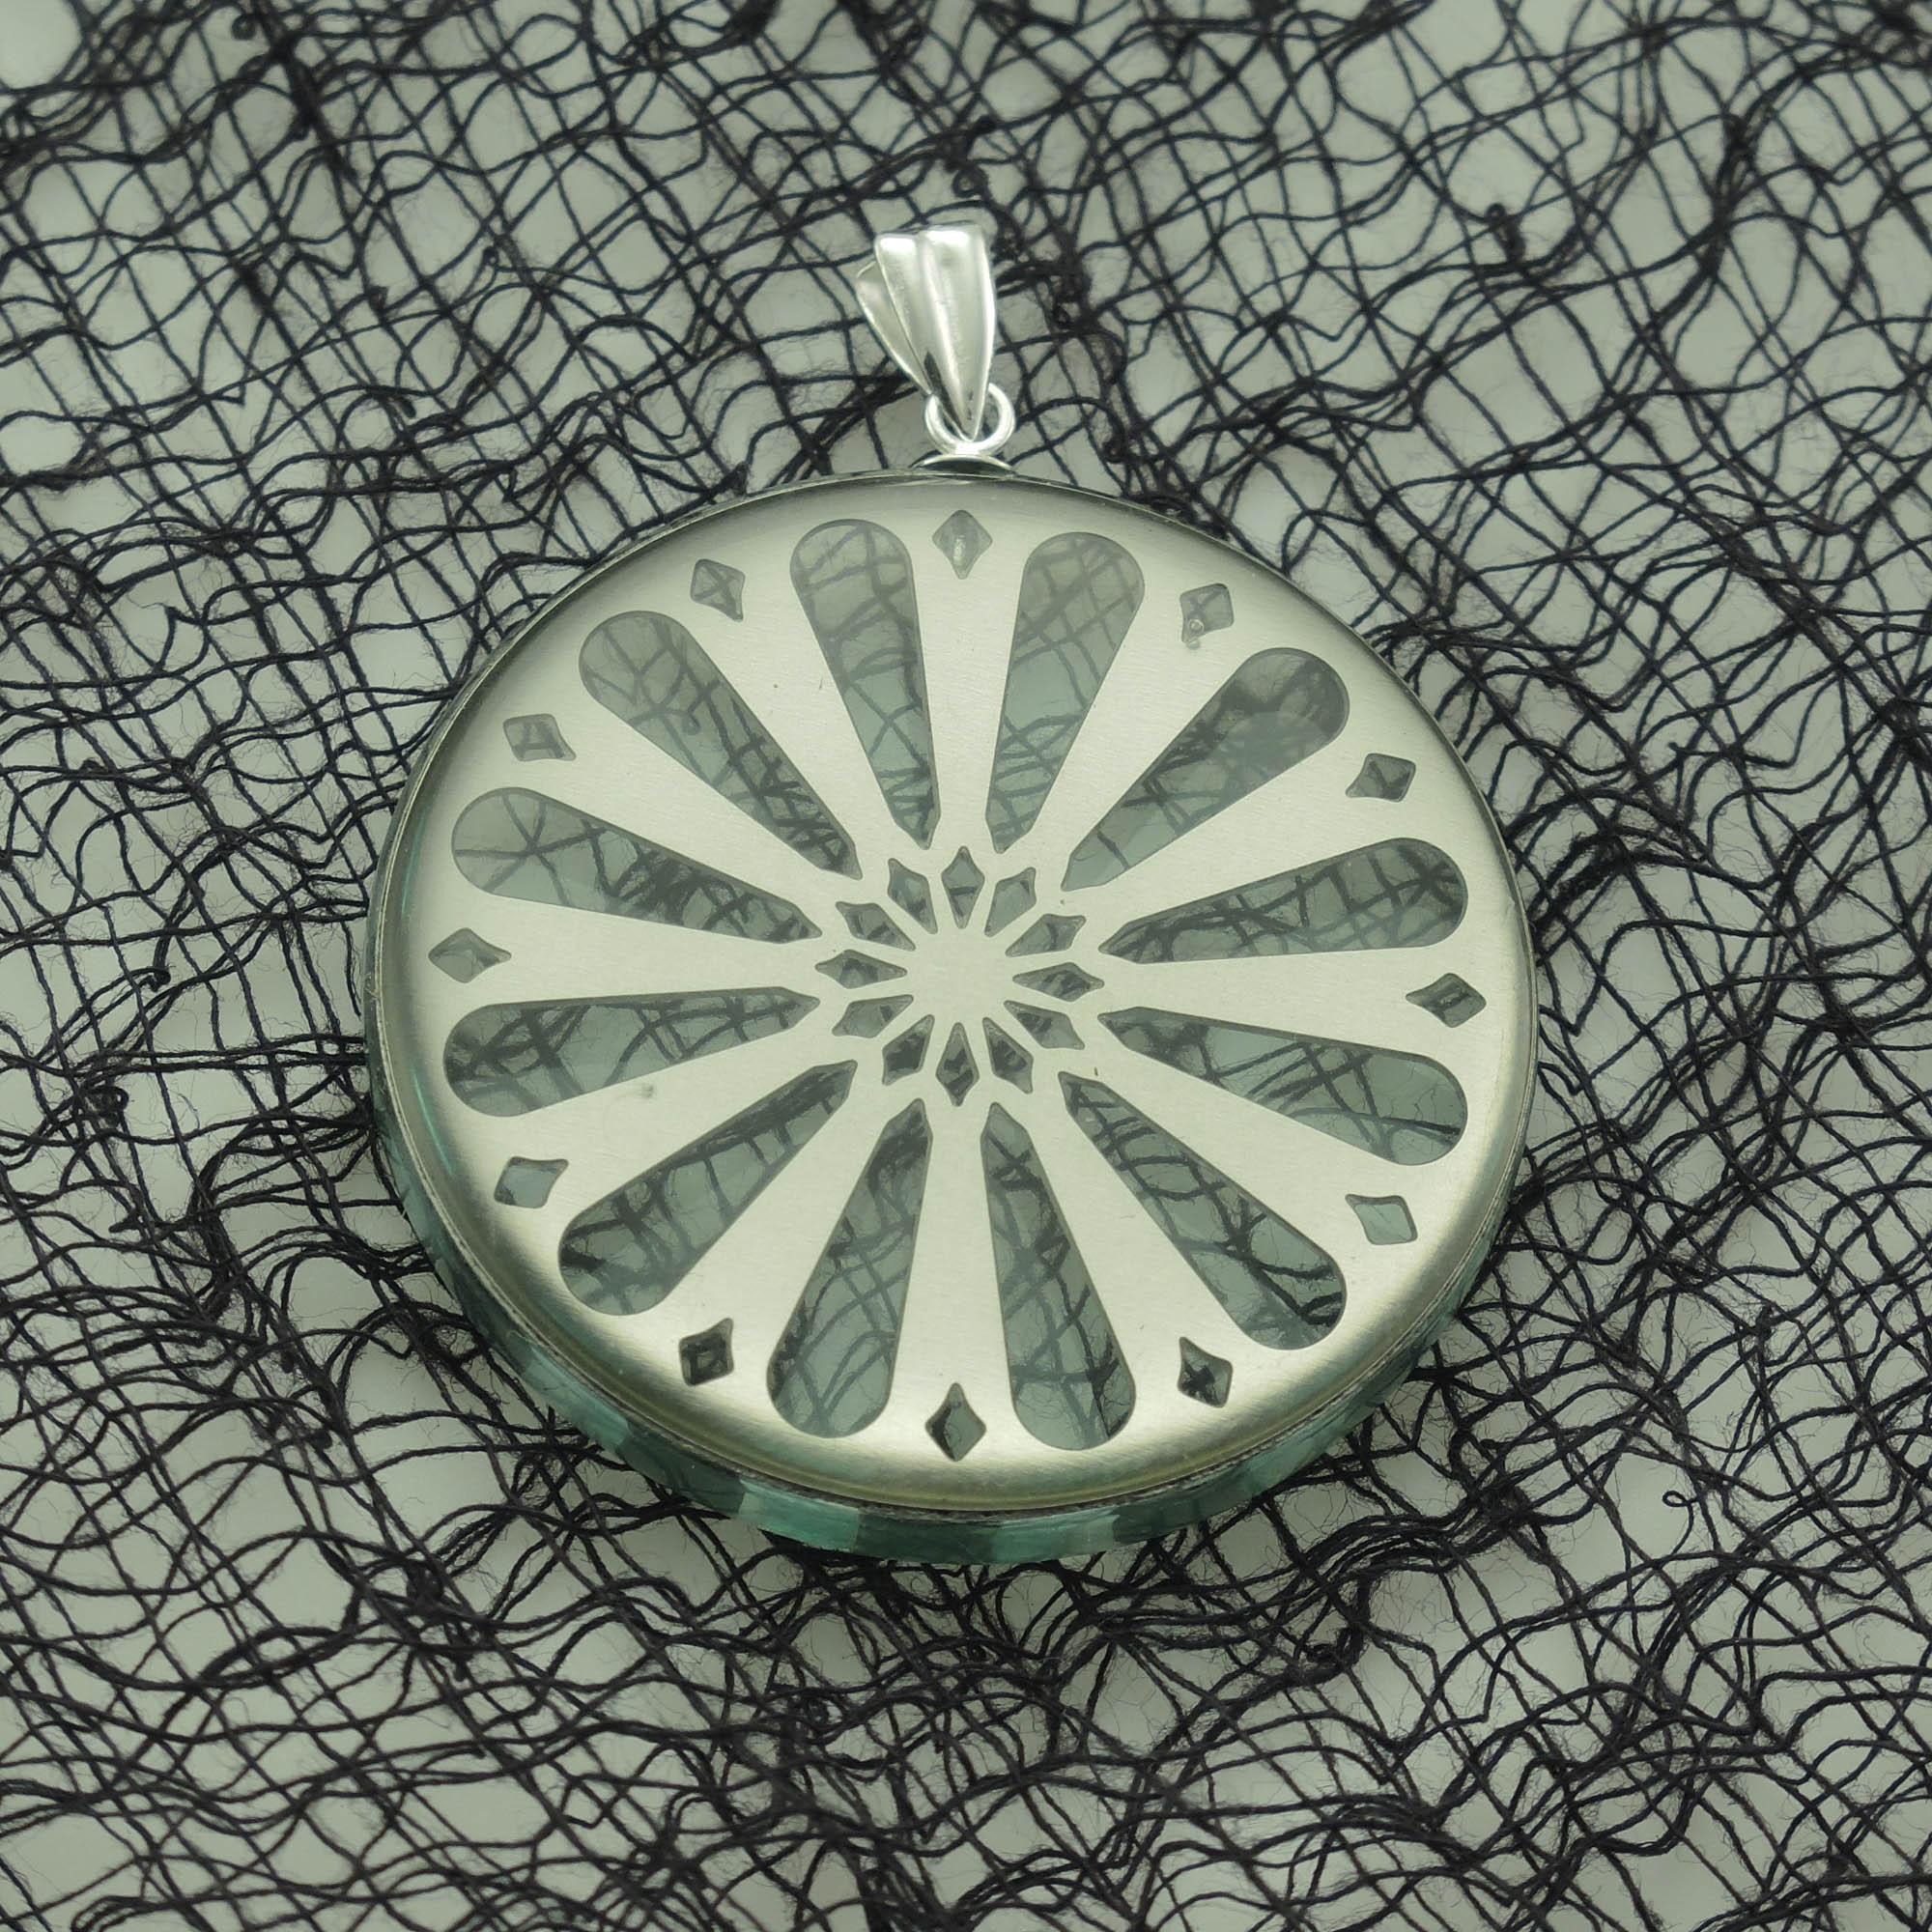 Stainless Steel Sunburst and Acrylic Pendant